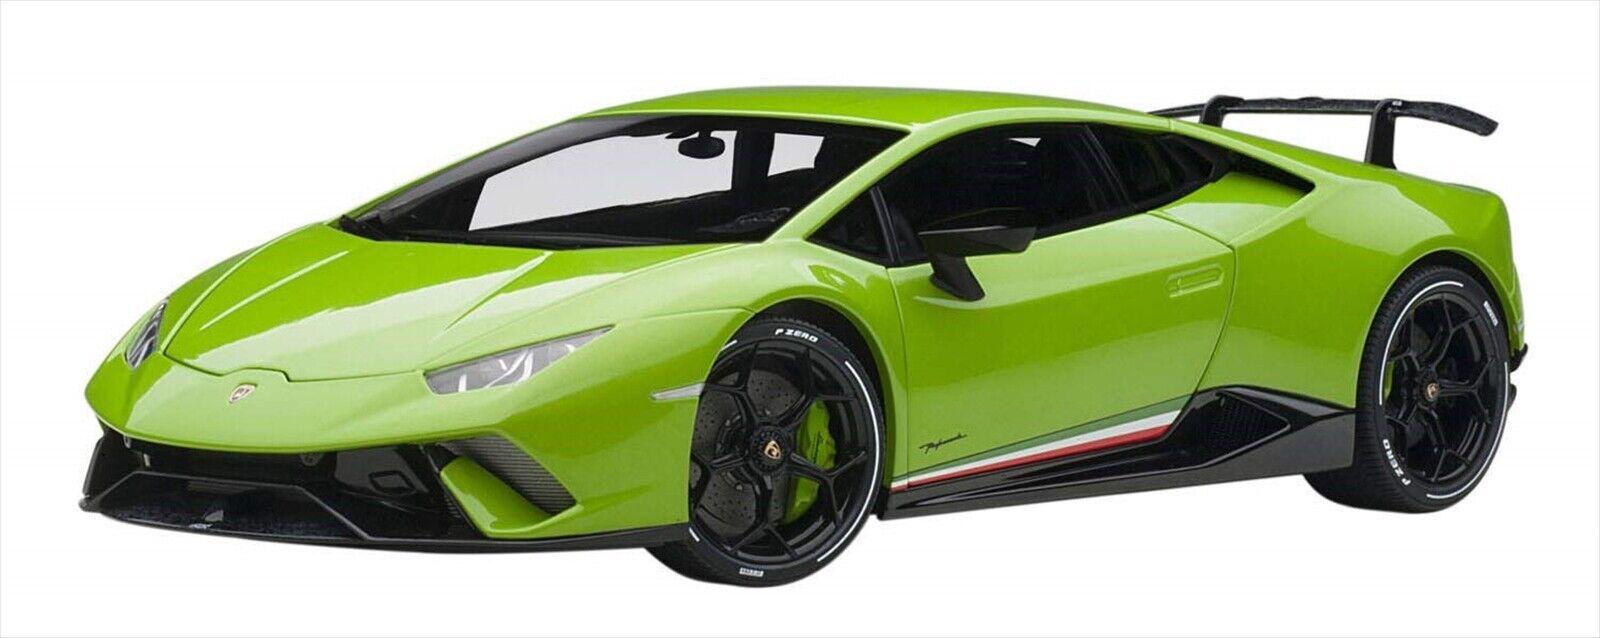 Autoart 1 18 Lamborghini Huracan Temps verde 79154 Nuevo